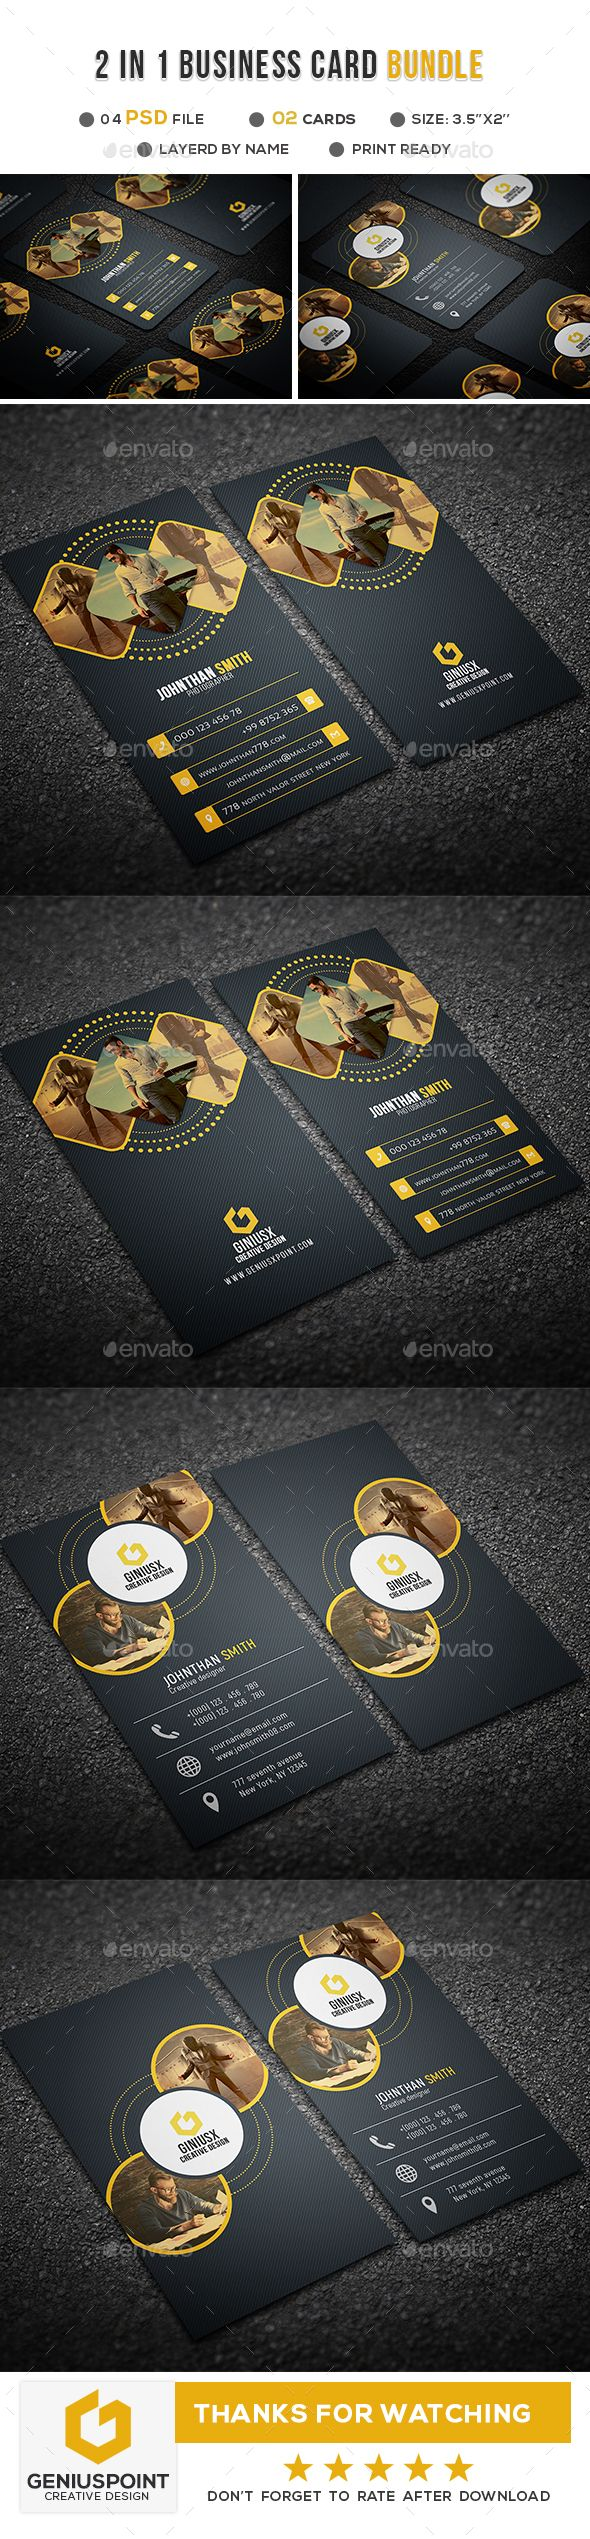 206 Best Business Cards Images On Pinterest Business Card Design